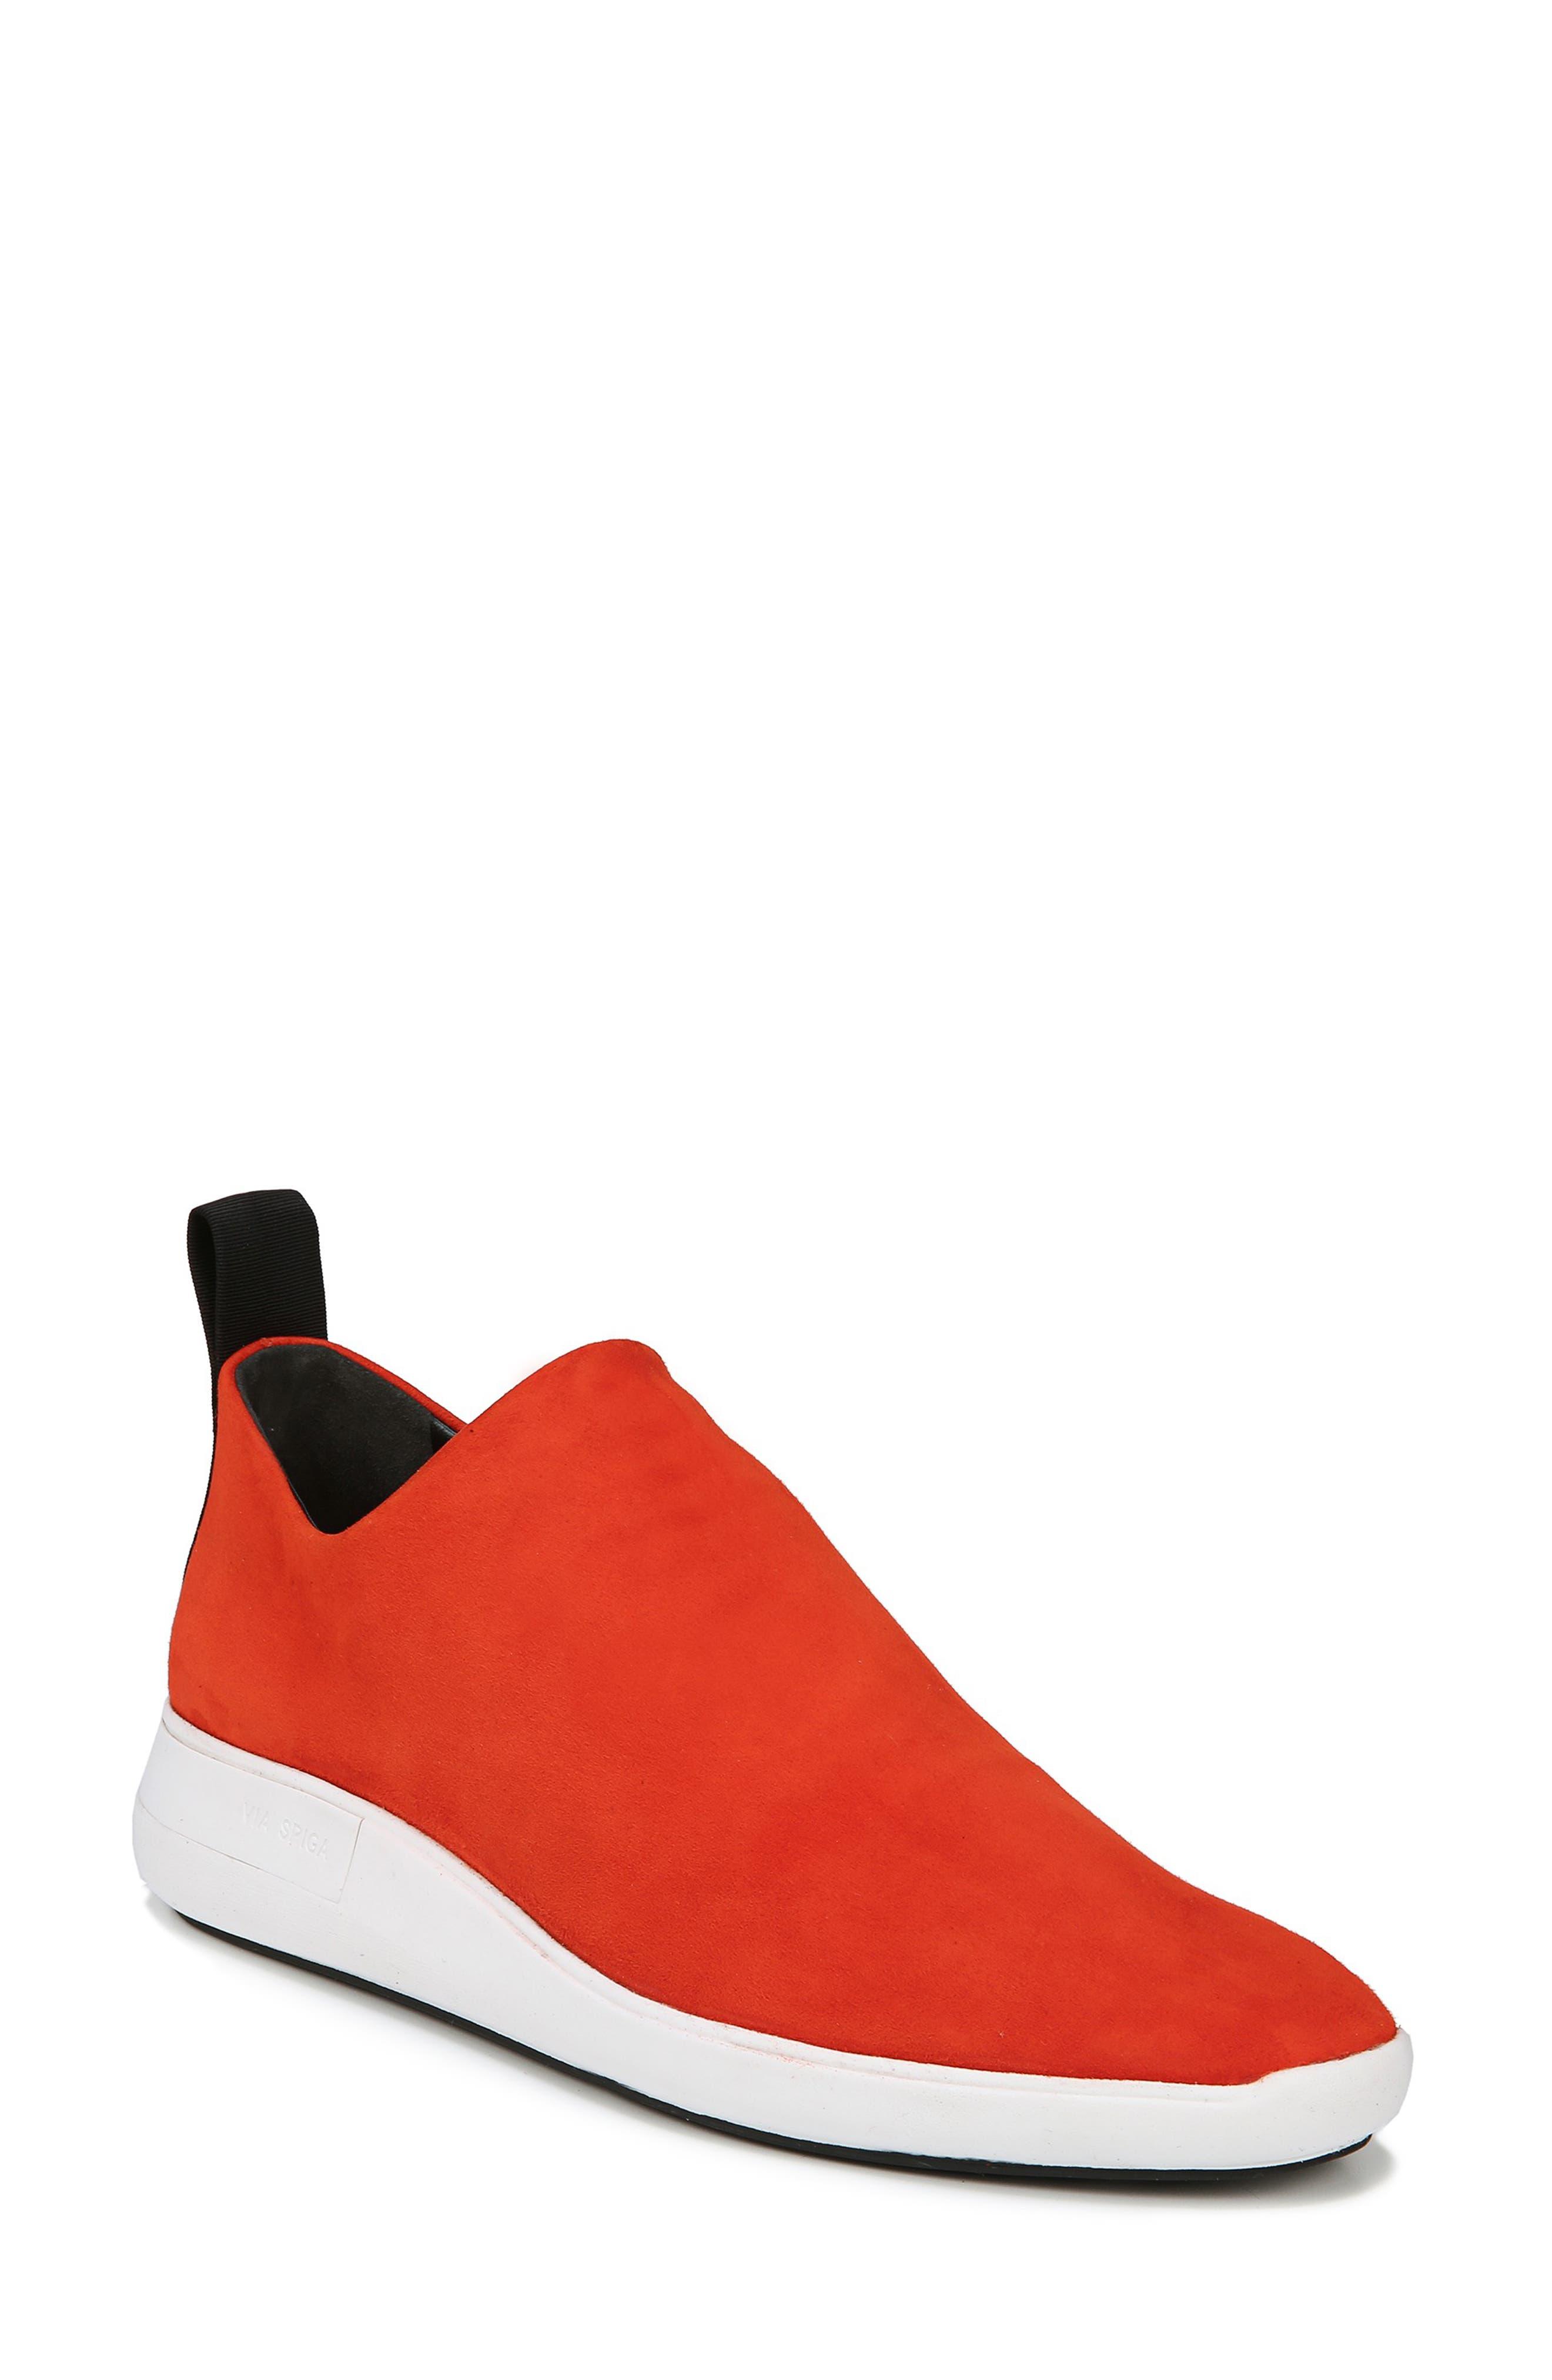 Marlow Stretch-Suede Sock Sneakers in Sienna